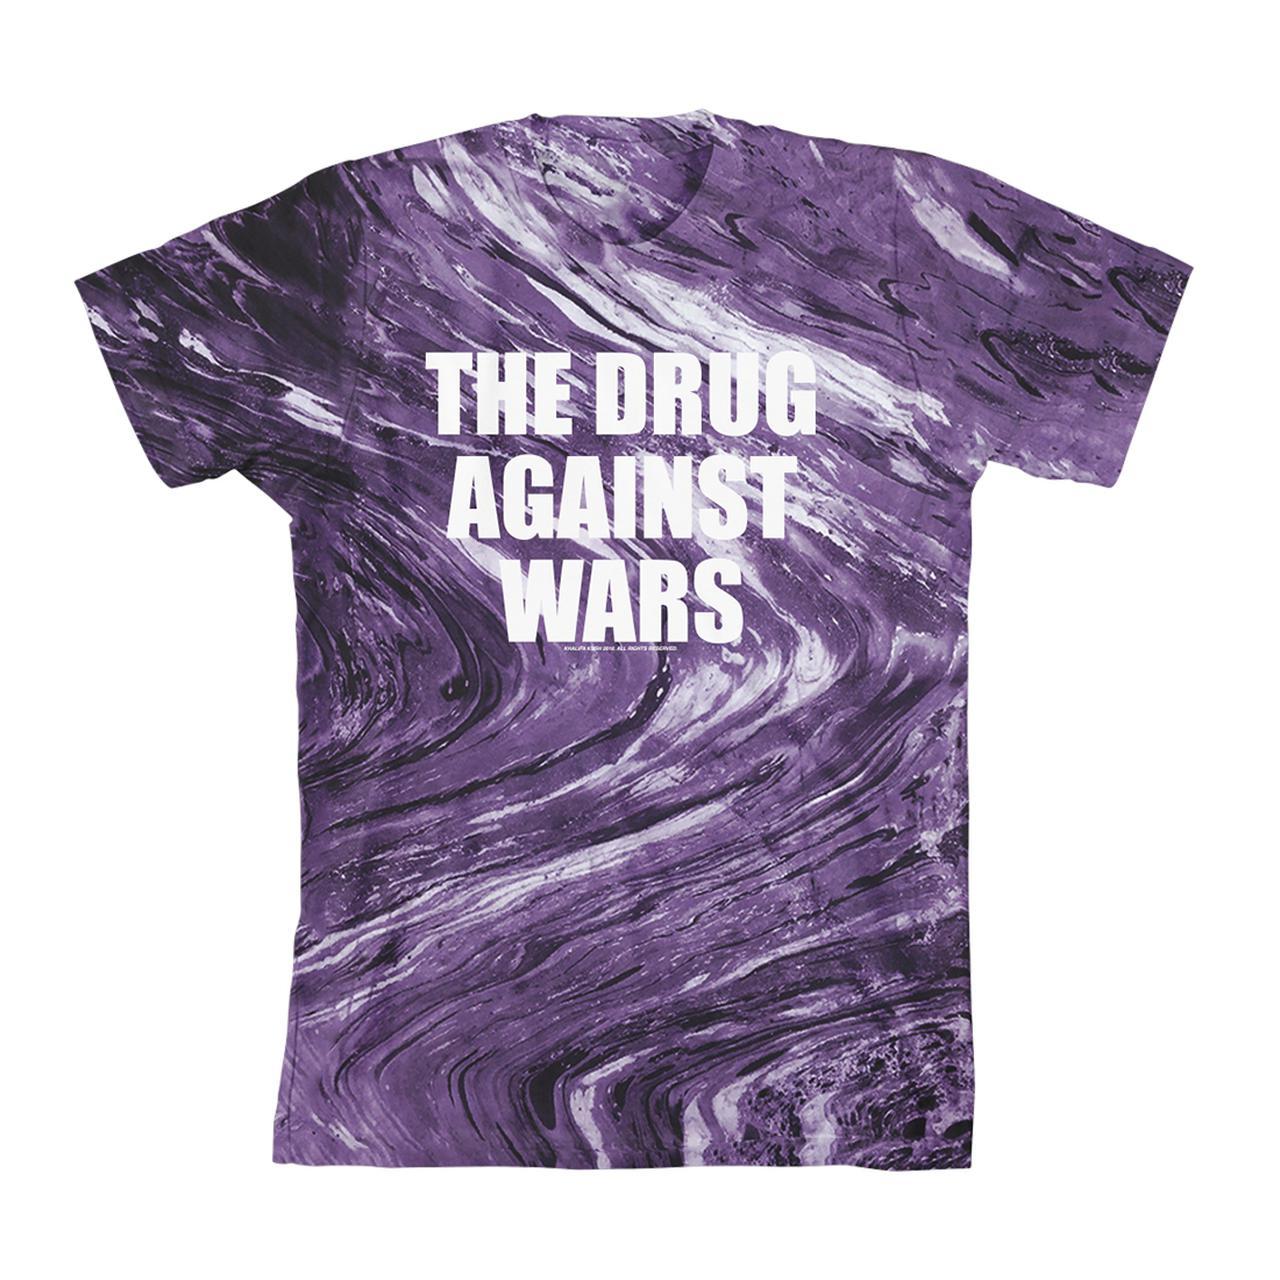 e8095f44b31 Wiz Khalifa Drug Against Wars Purple Tie Dye T-Shirt